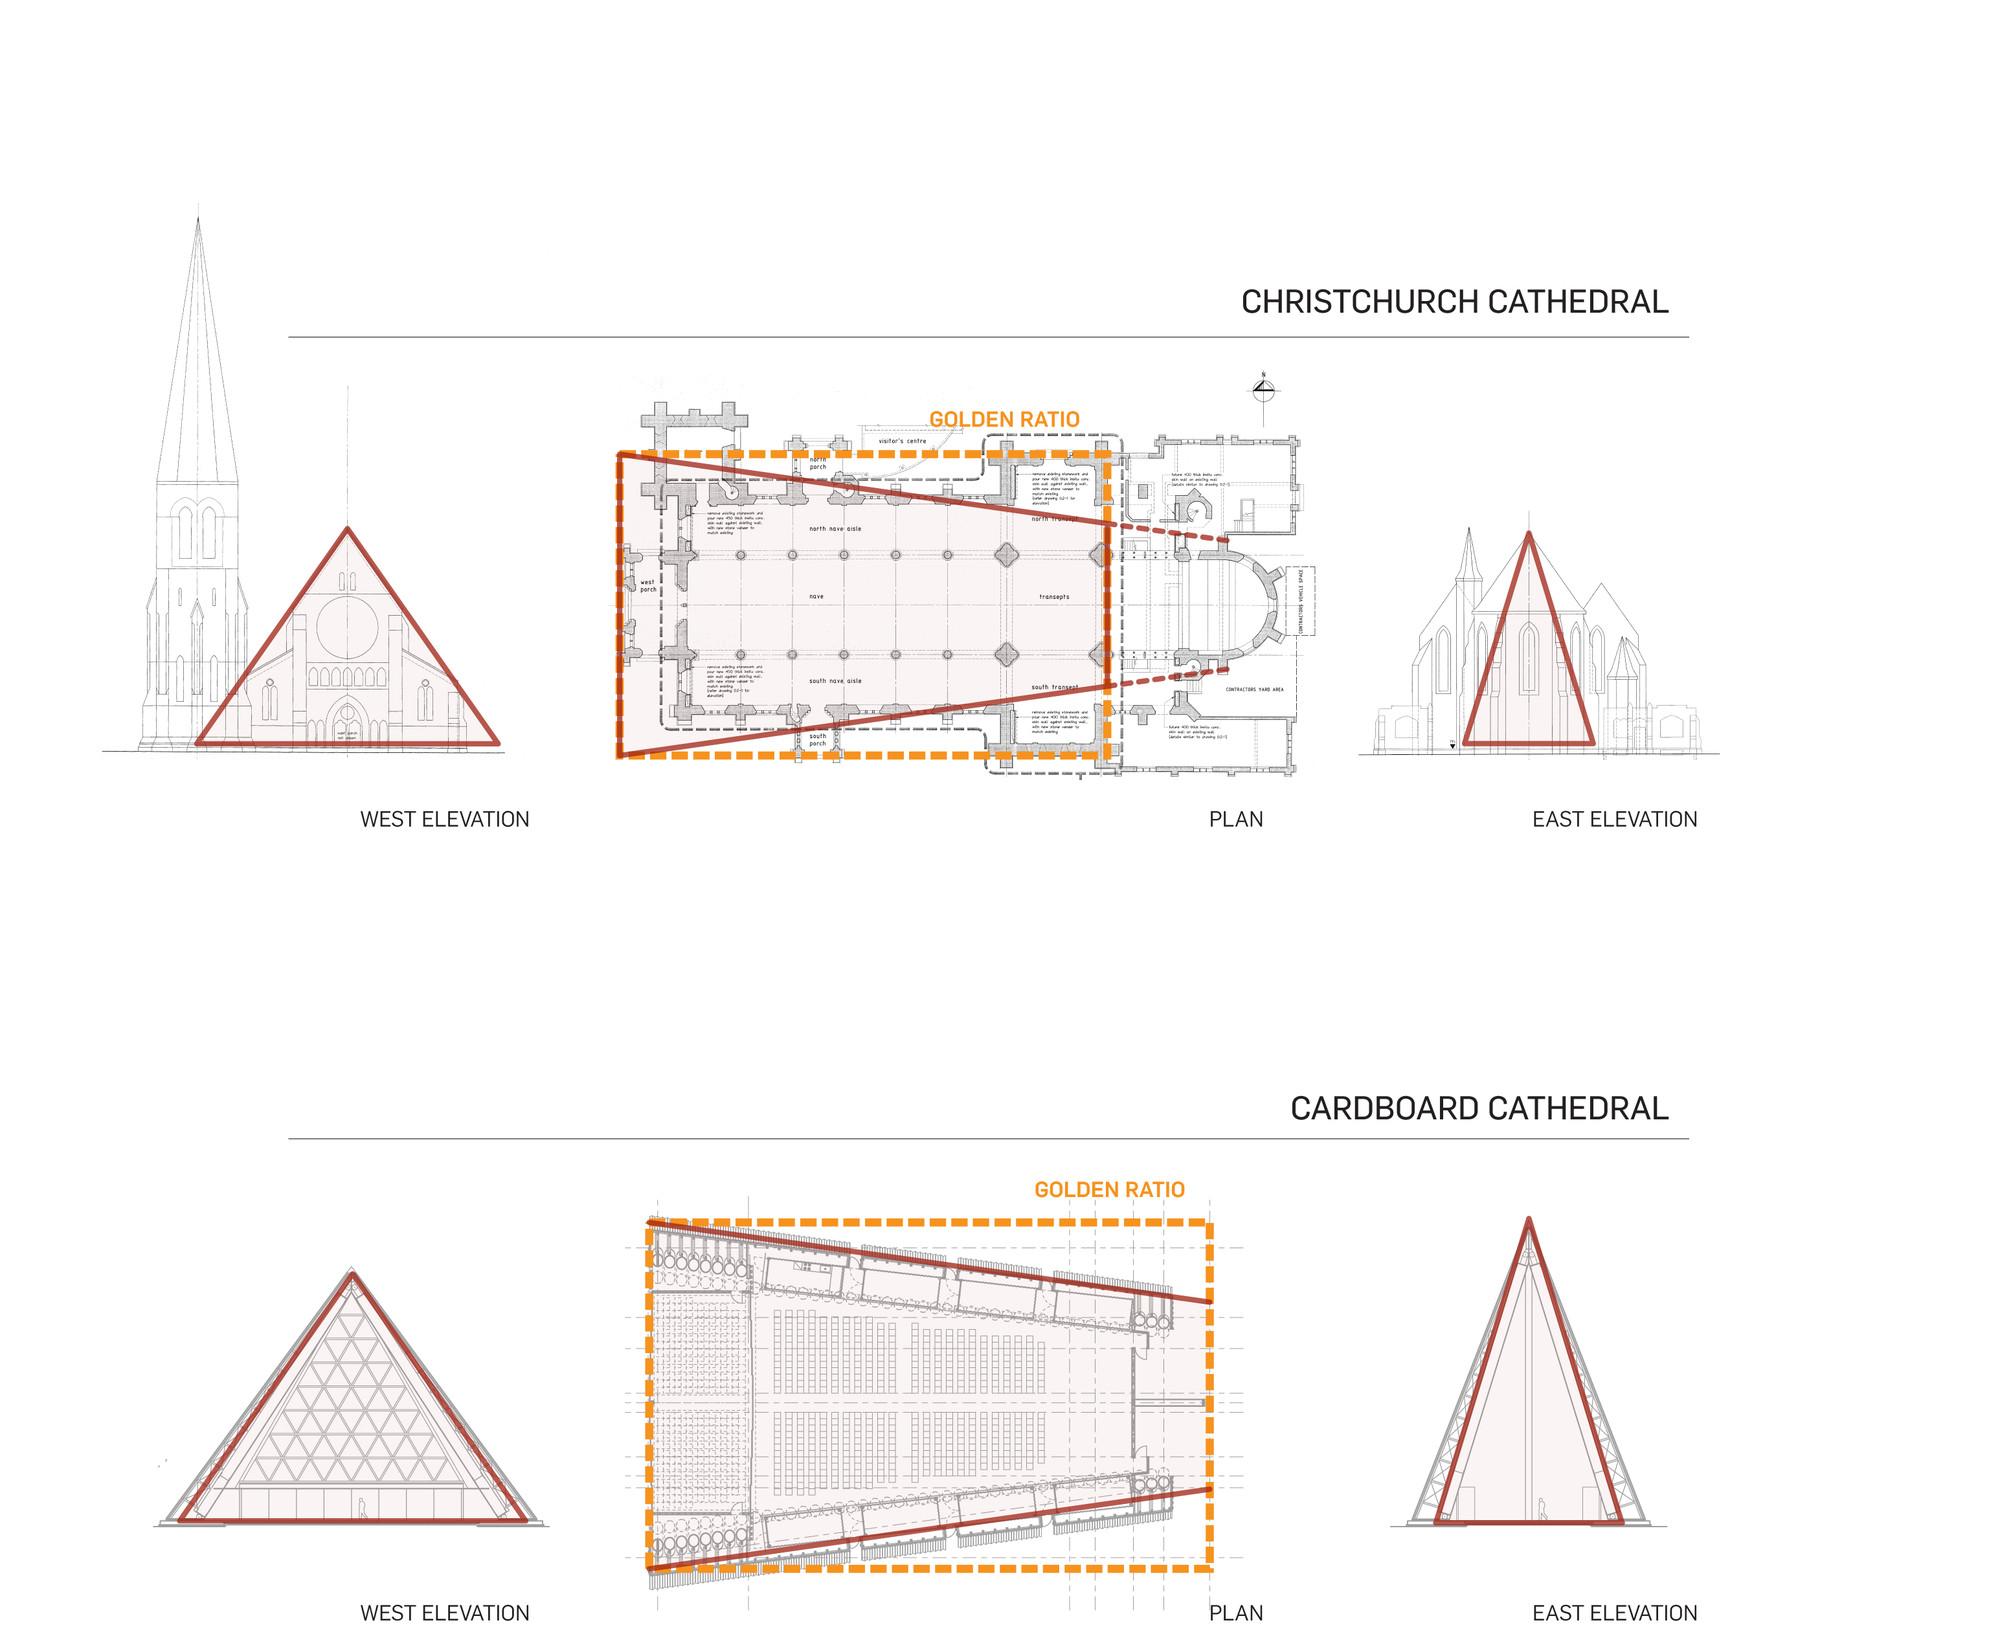 Triangular House Floor Plans Gallery Of Shigeru Ban S Cardboard Cathedral Underway In